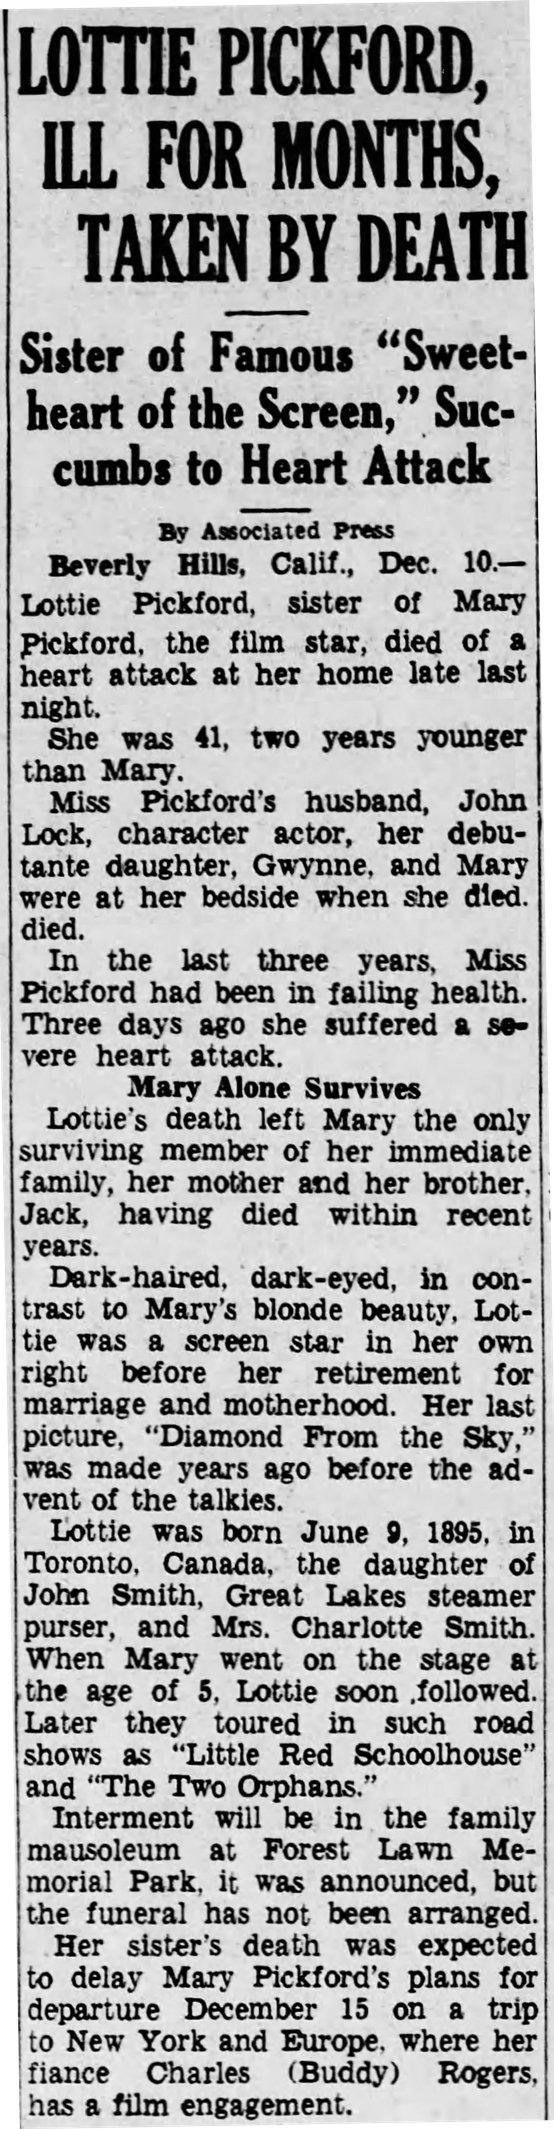 Source: Harrisburg Telegraph, December 10, 1936, page 13.